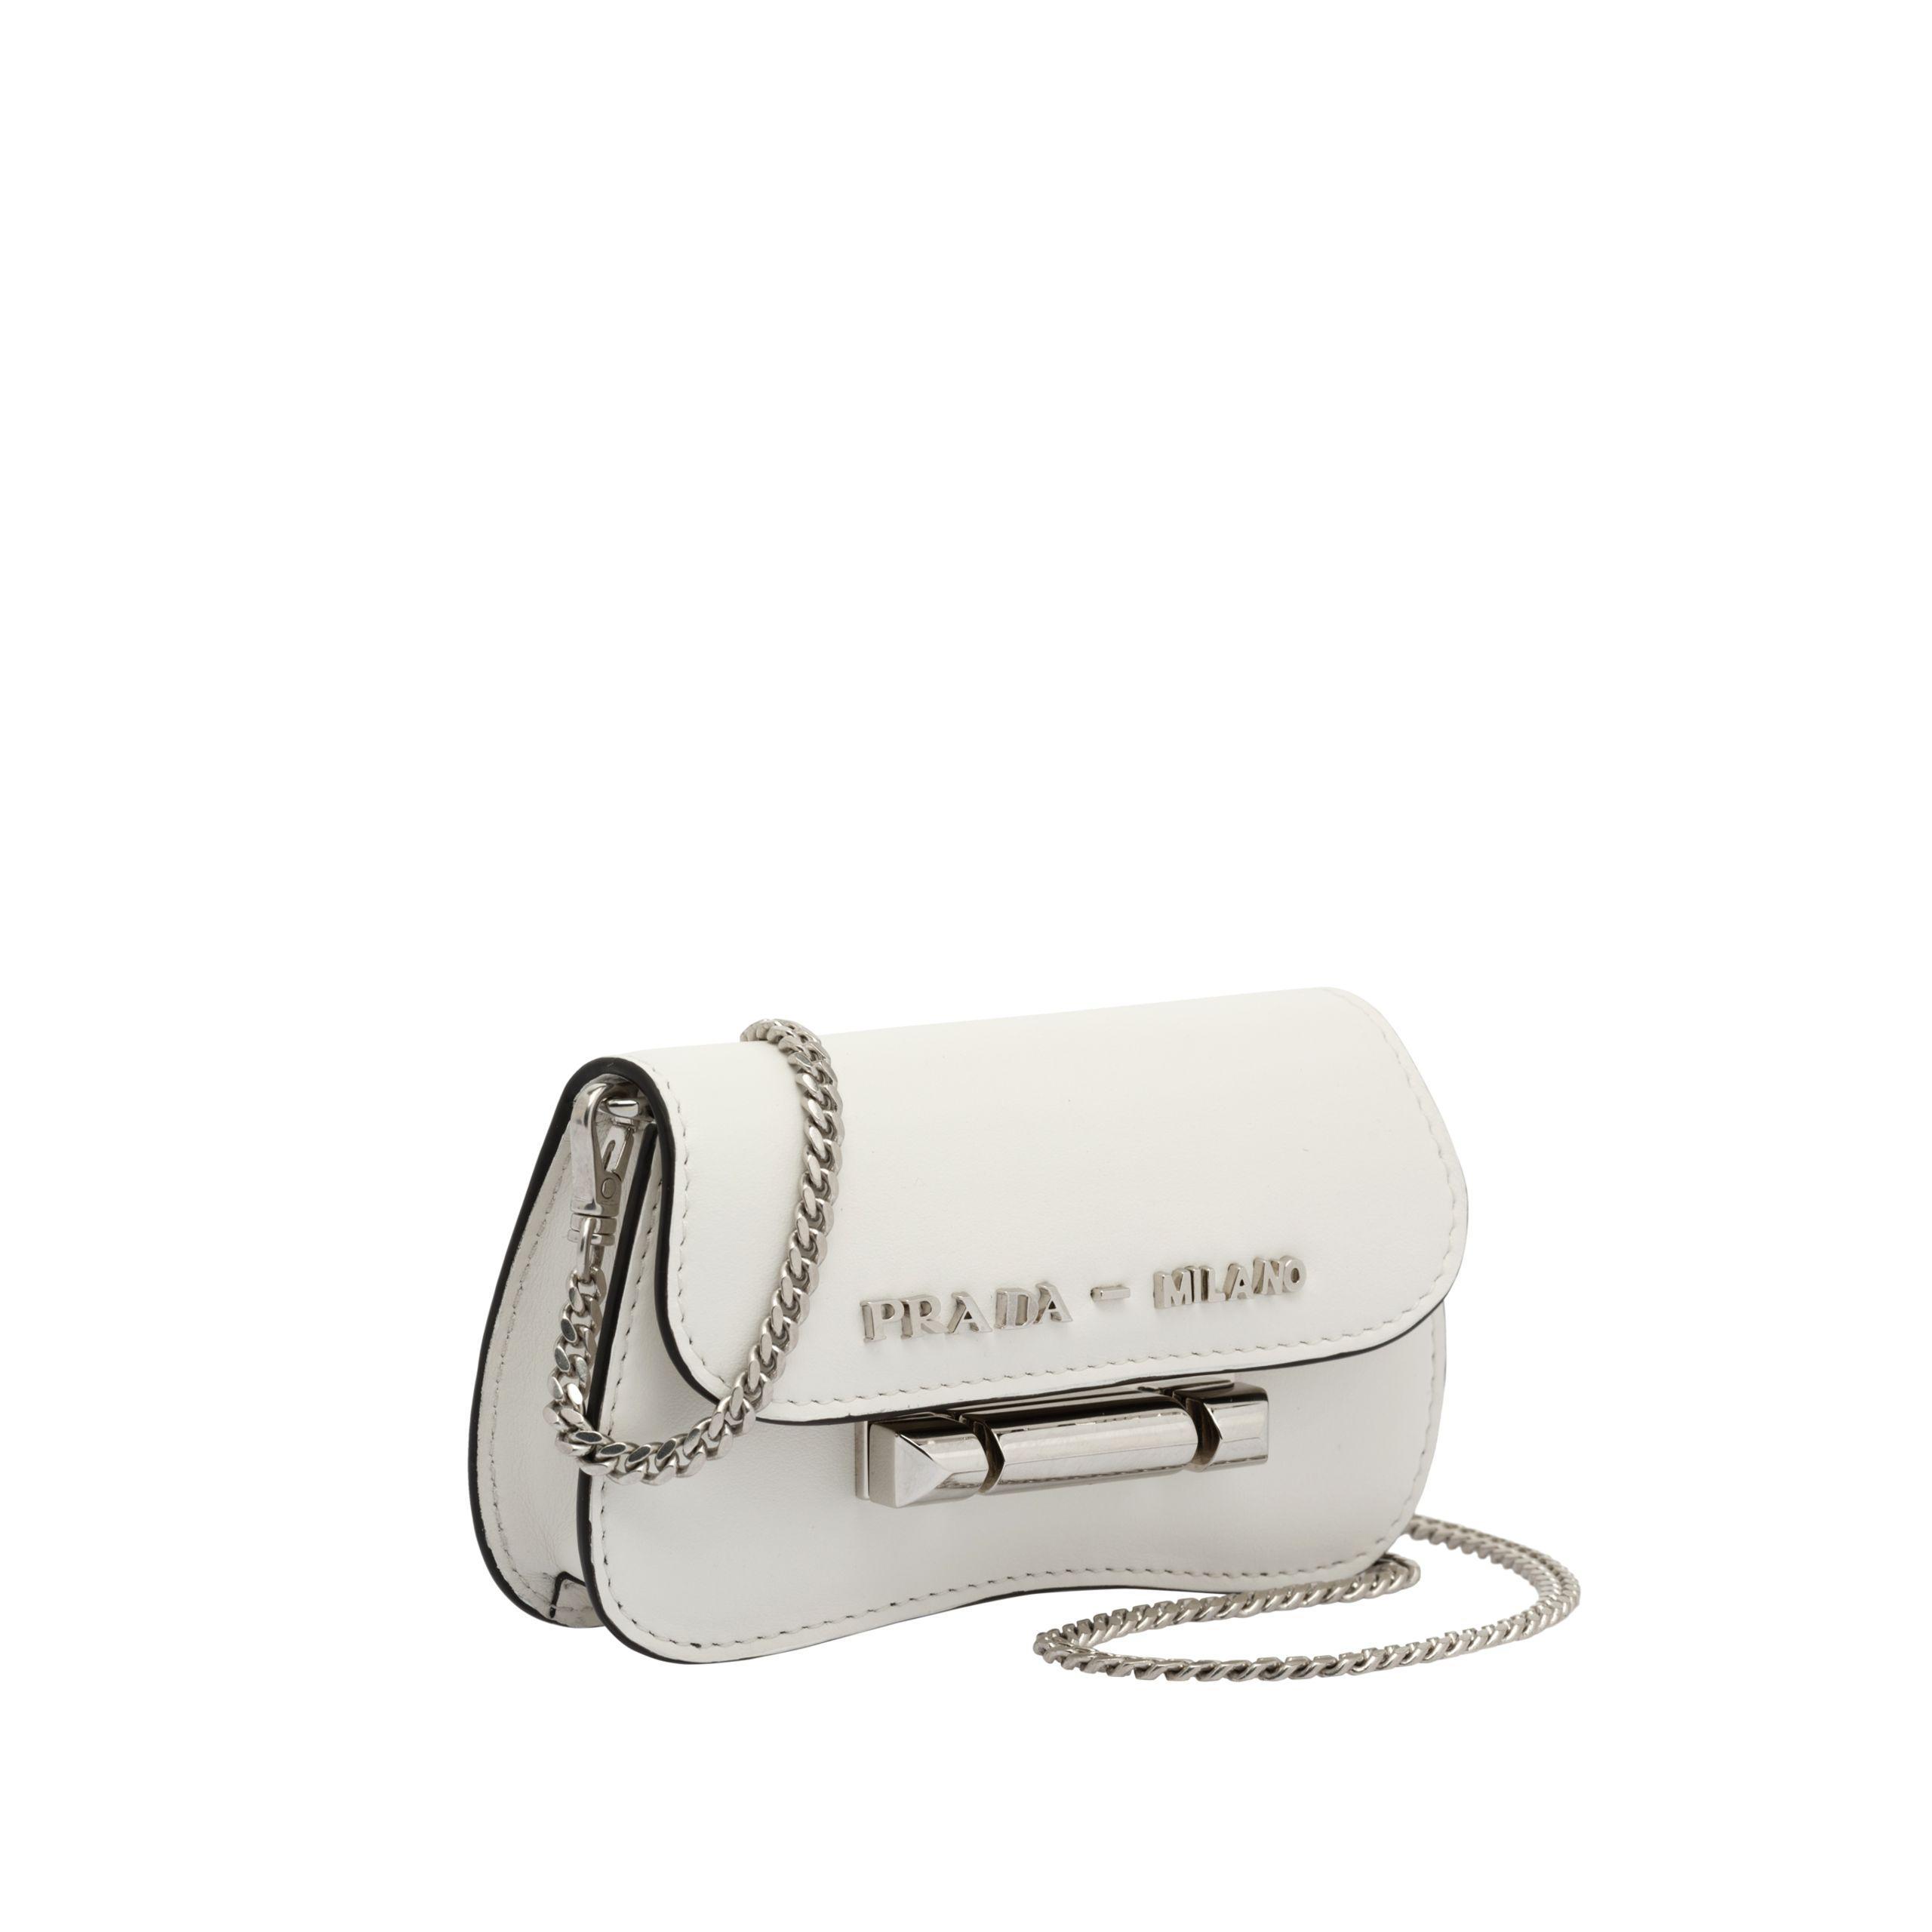 546a6d347e Prada Multicolor Sybille Leather Mini-bag